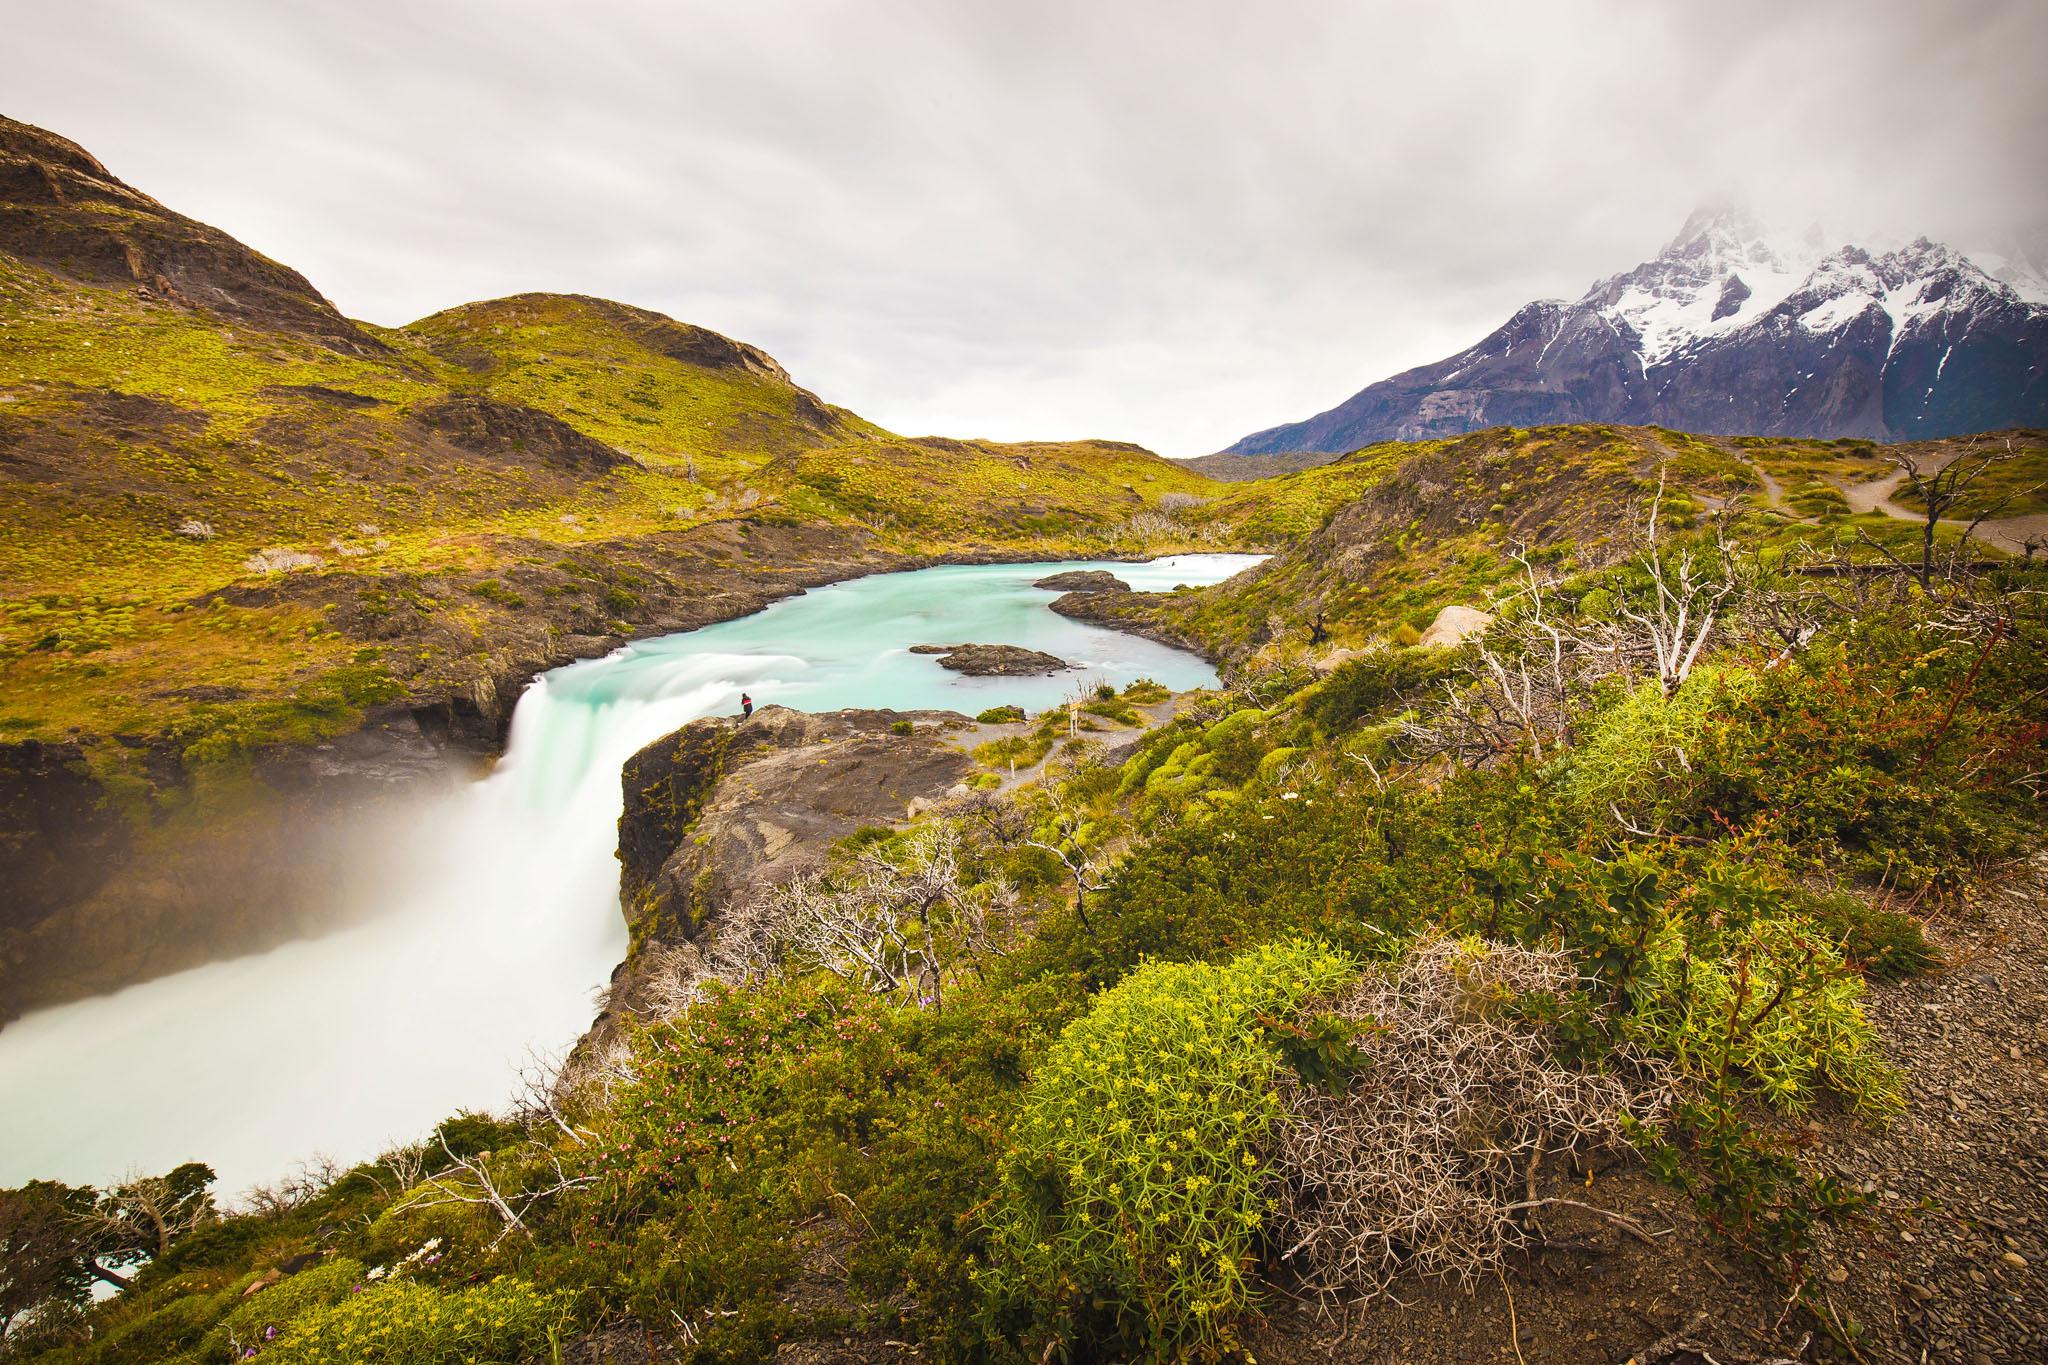 Wedding-Travellers-Overlanding-Destination-Wedding-Chile-Torres-del-Paine-salto-grande-big-waterfall